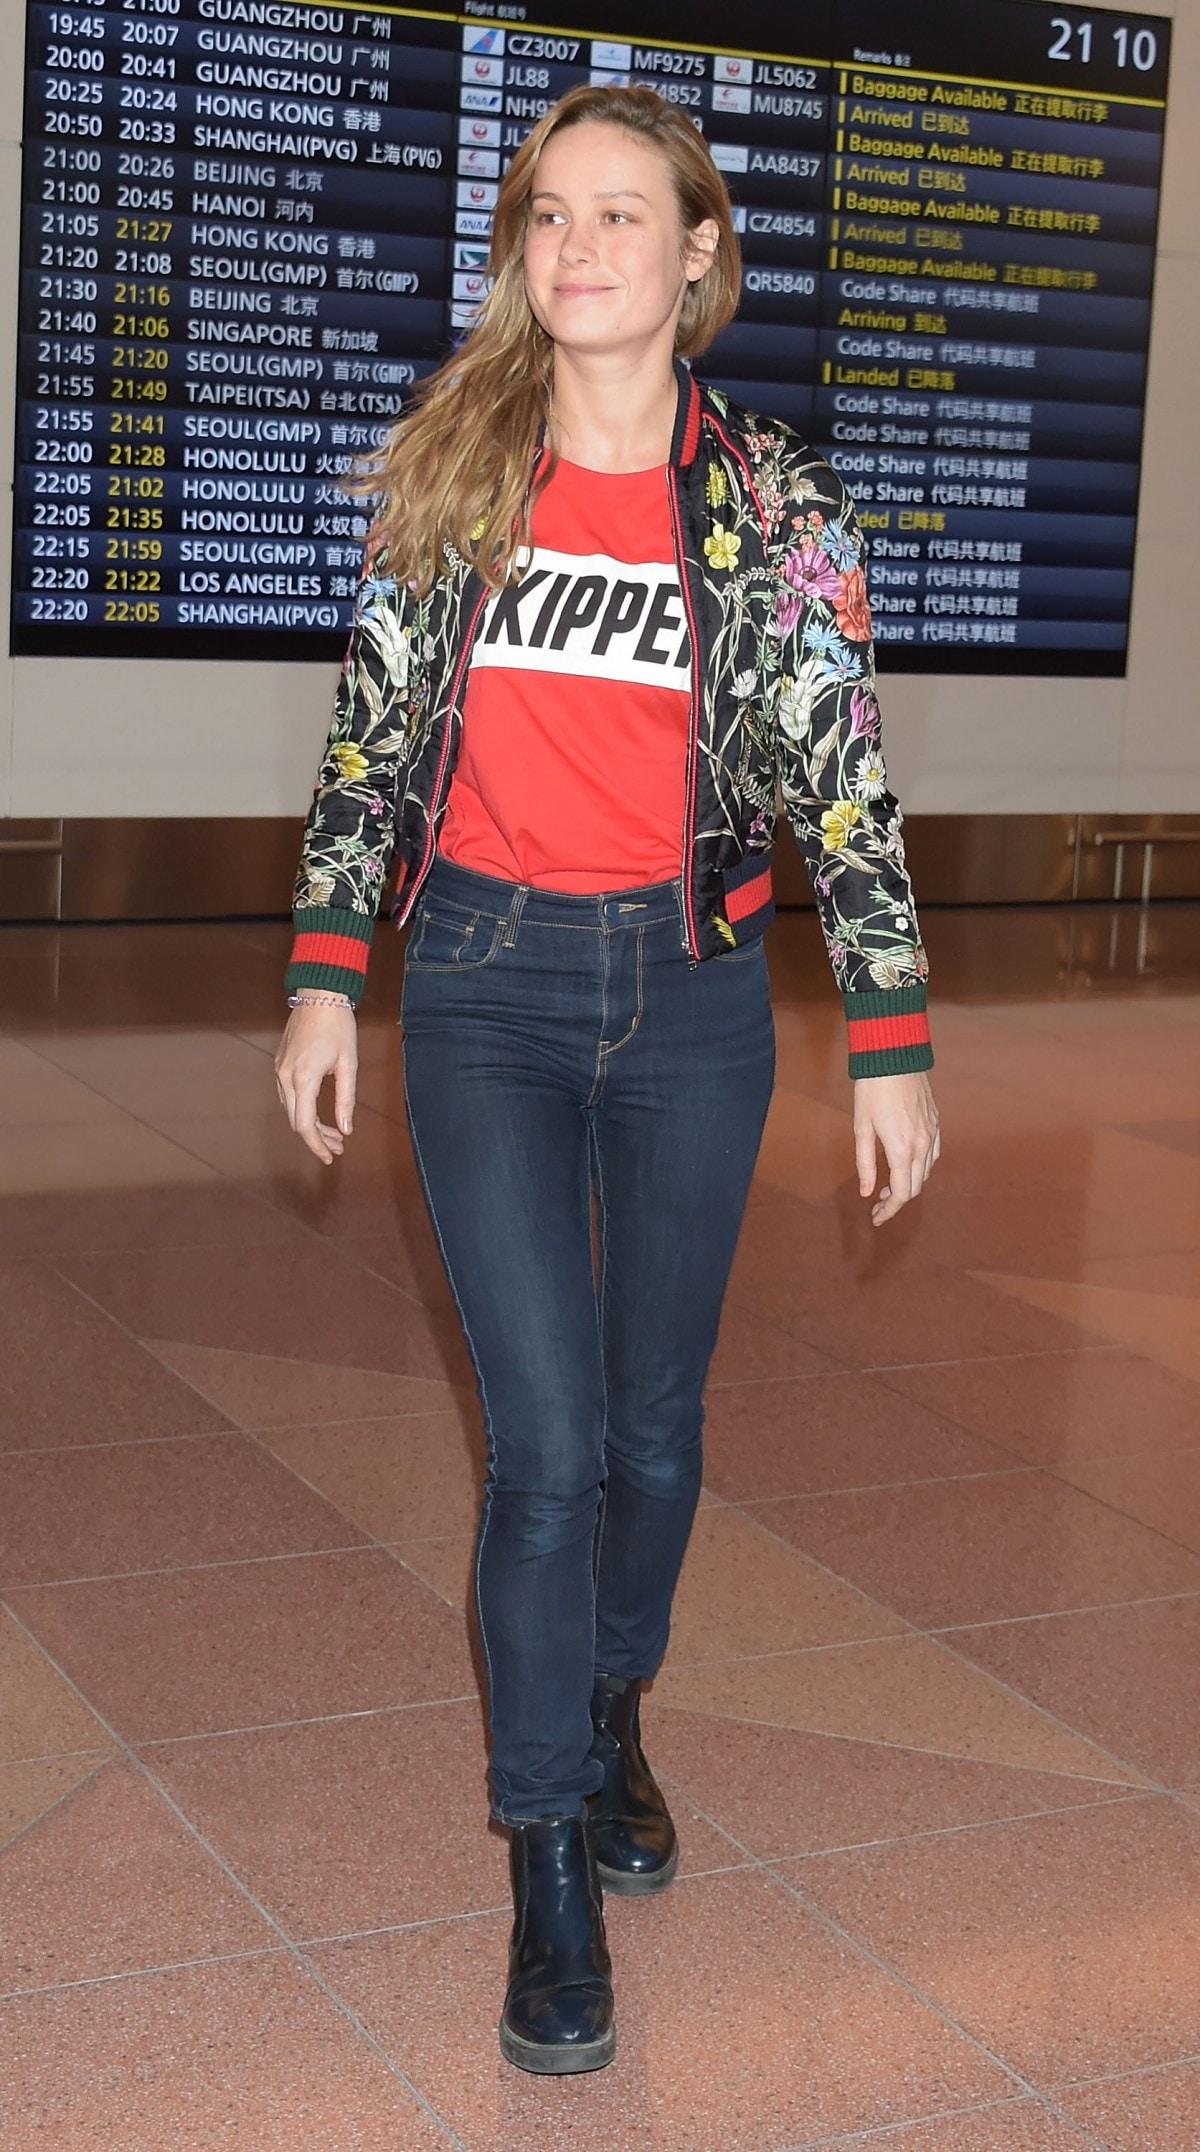 Brie Larson Sighting In Tokyo